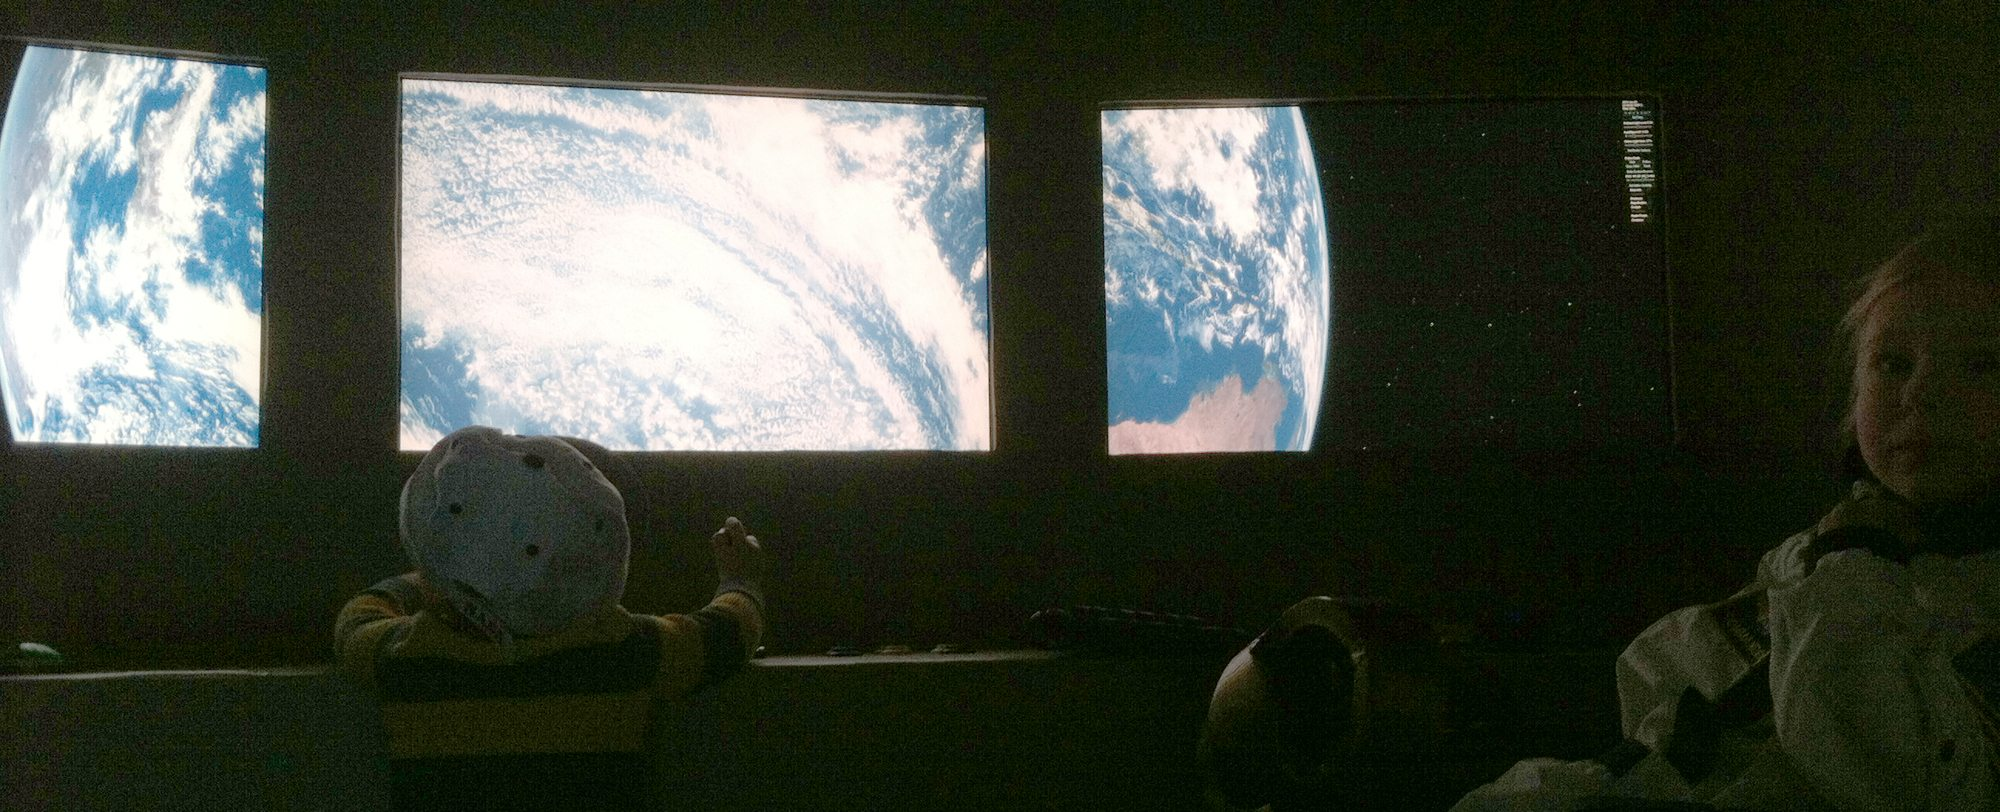 Daniel H. Wilson spacecraft simulator